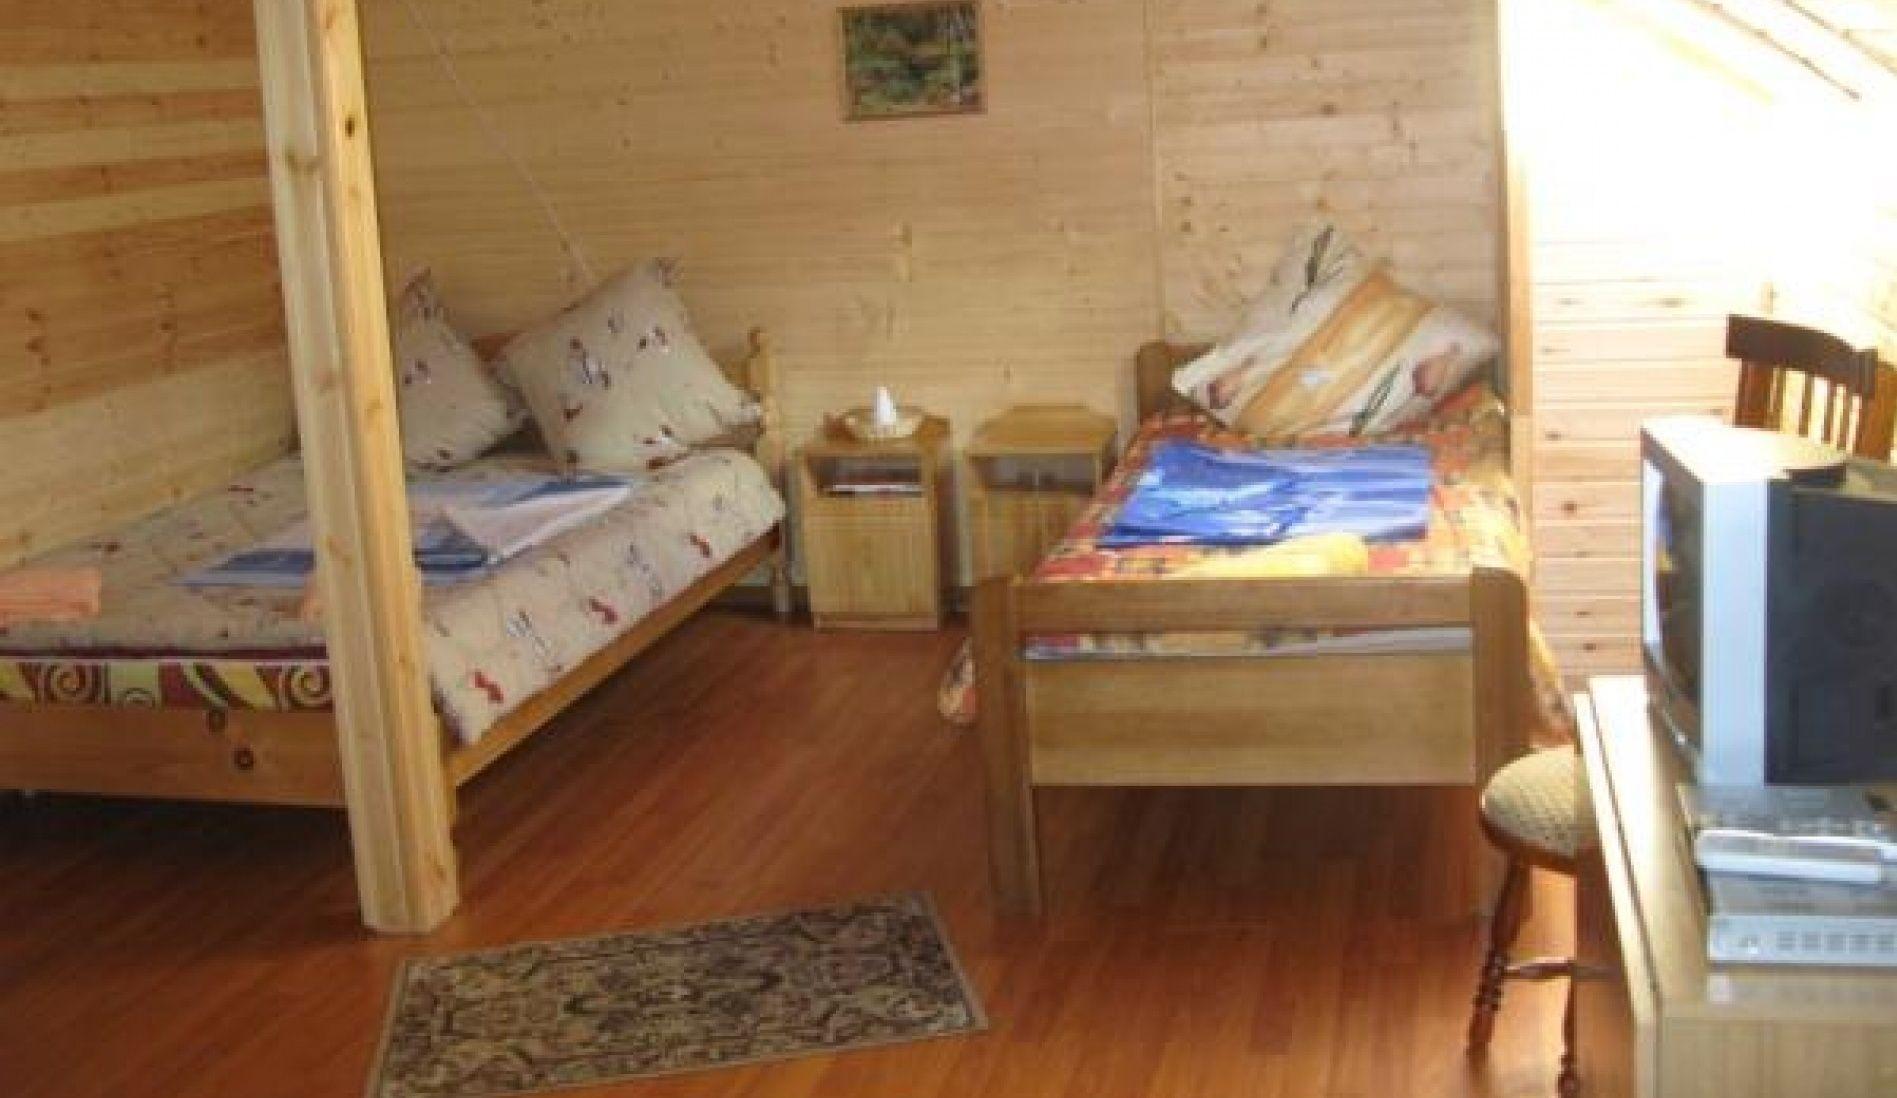 Recreation center «Saturn» Moscow oblast Nomer «Komfort+ 2-mestnyiy», фото 2